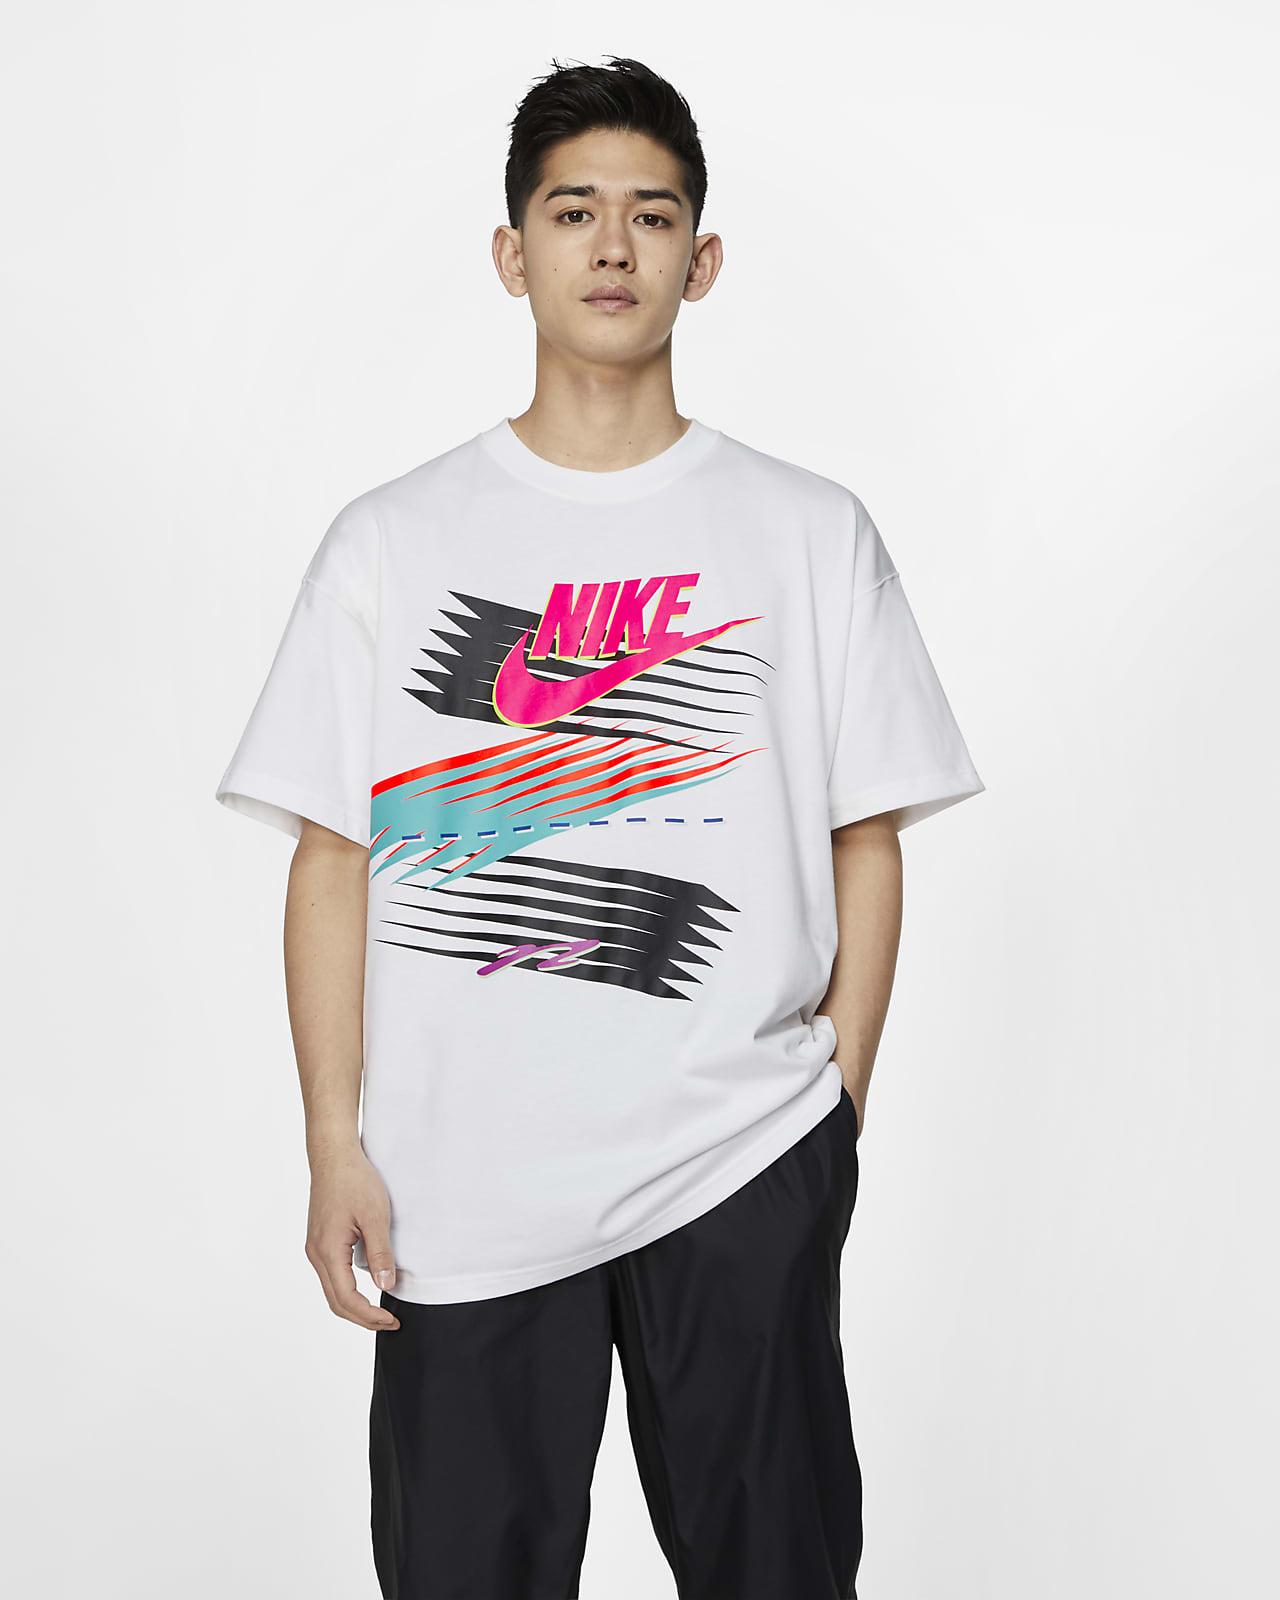 esperanza entusiasta yermo  Nike x atmos Men's T-Shirt. Nike.com